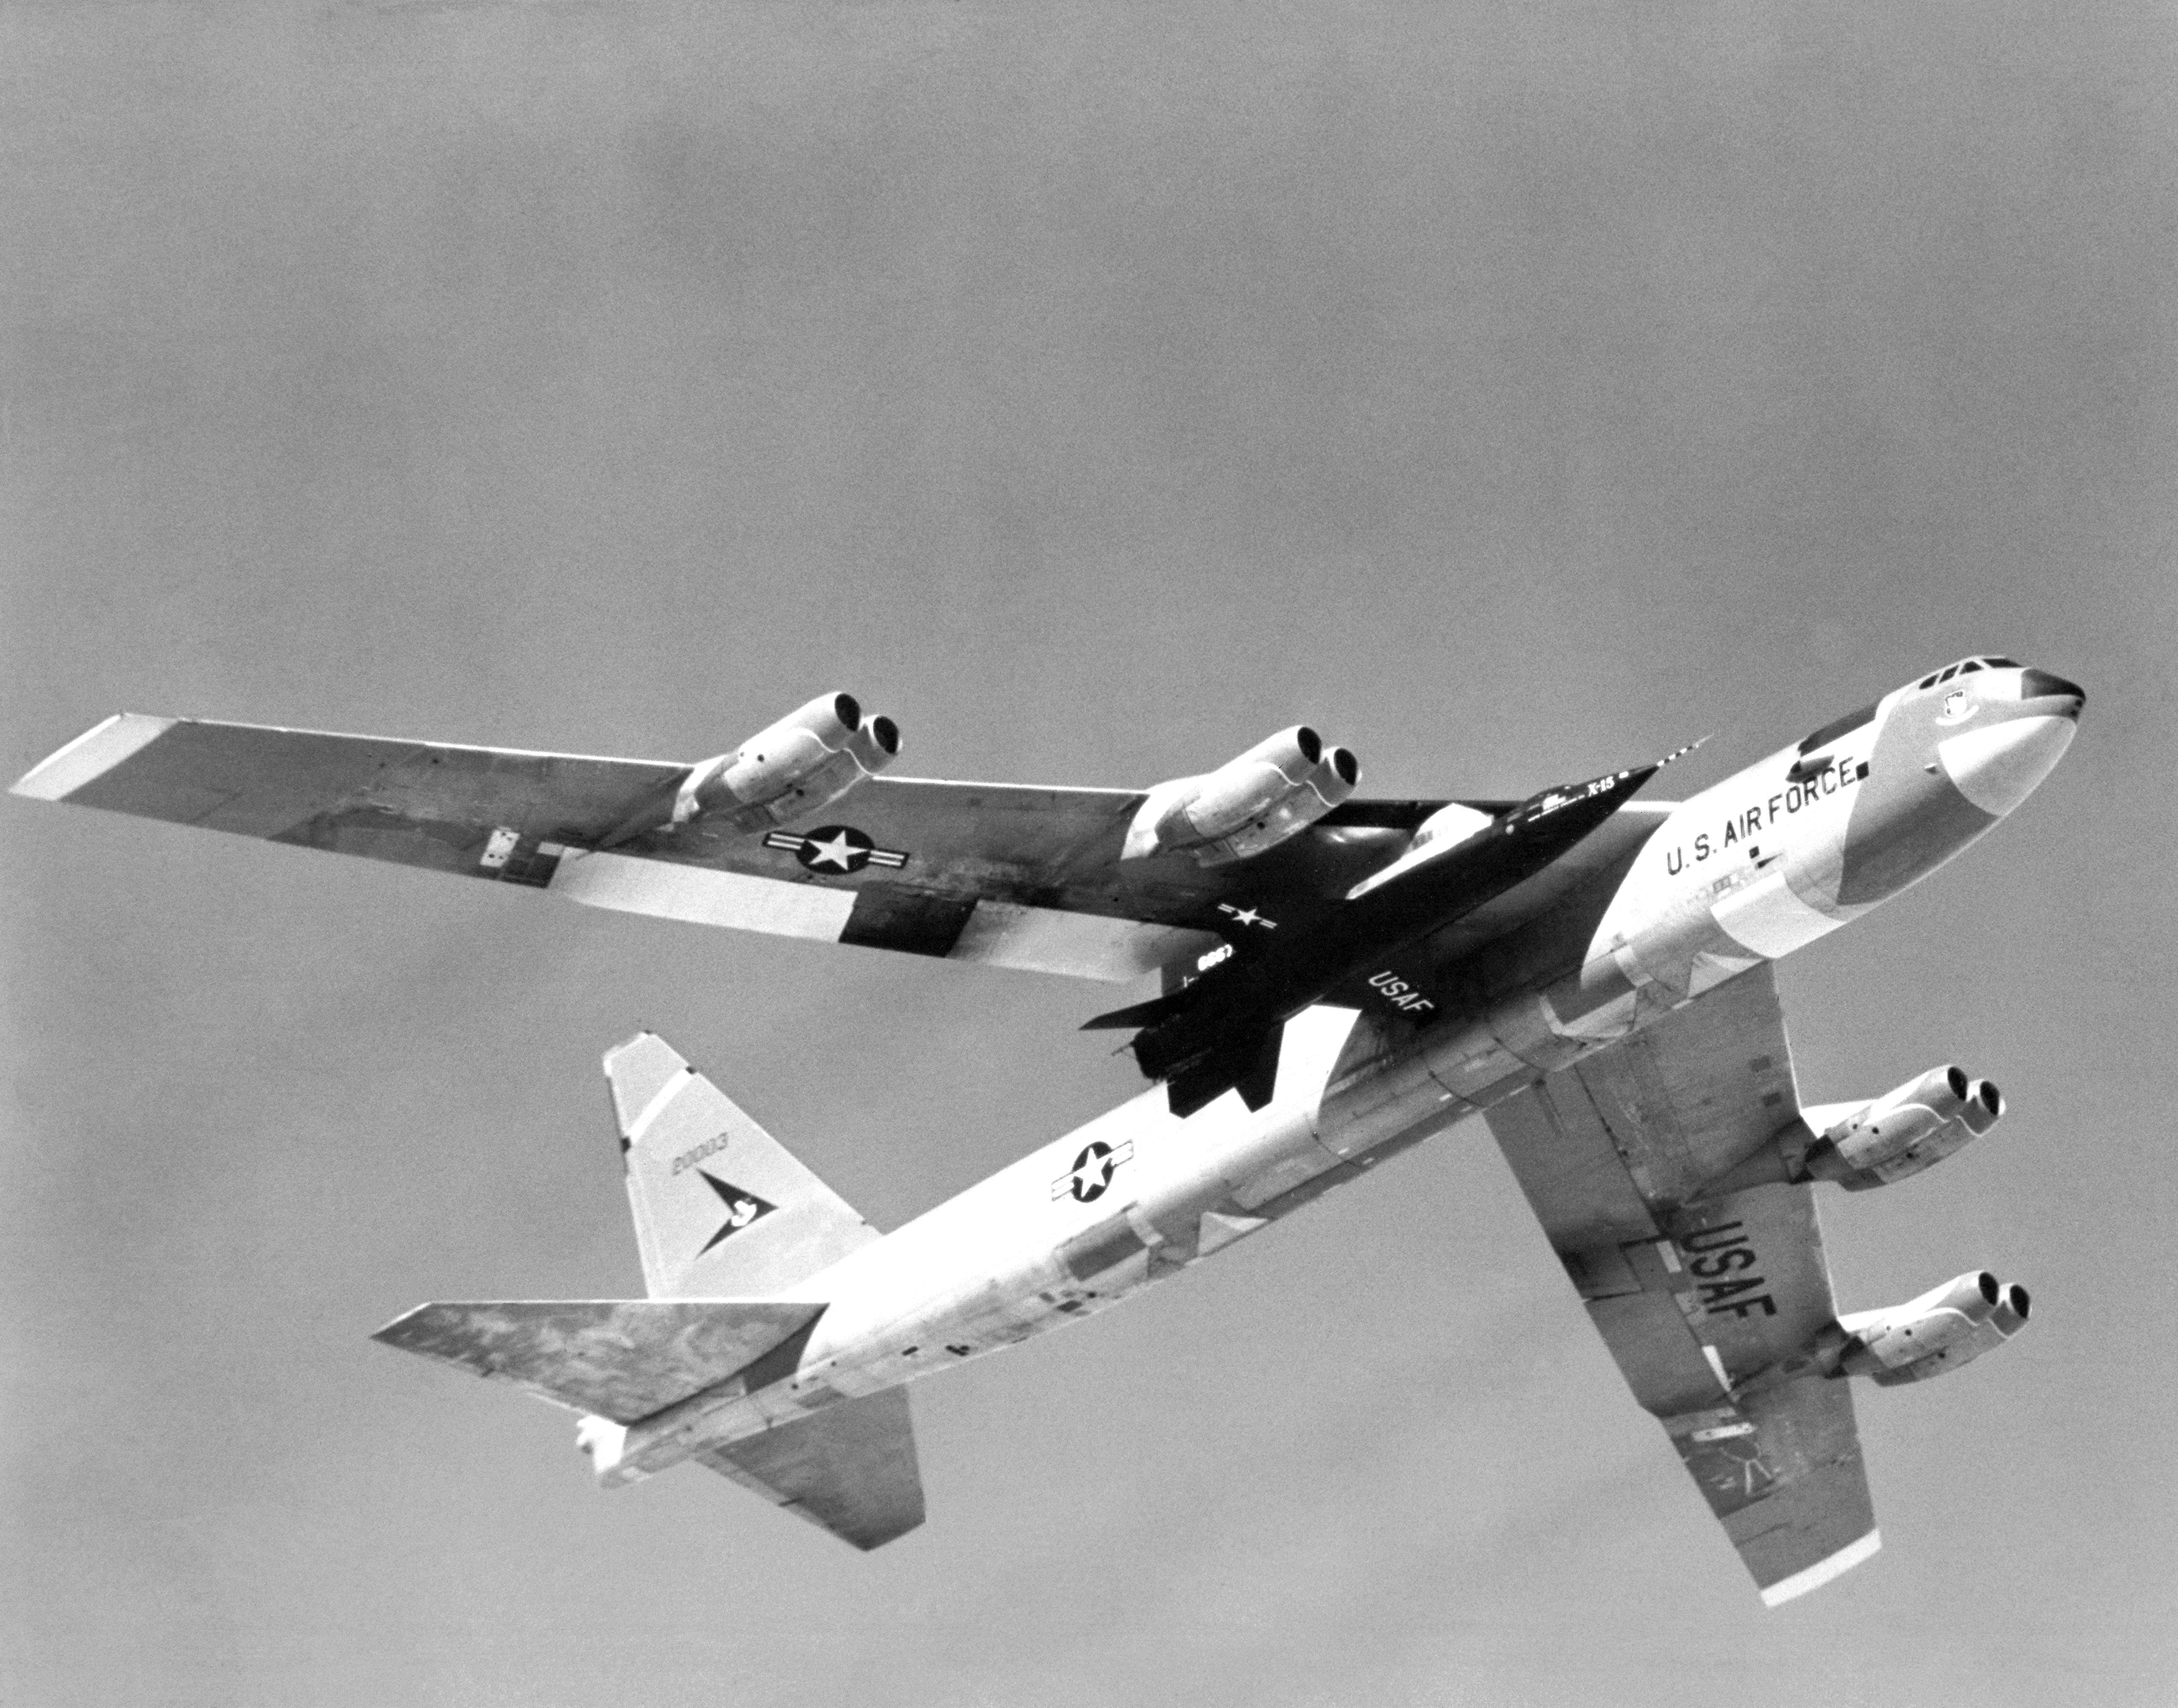 nasa b-52 - photo #7